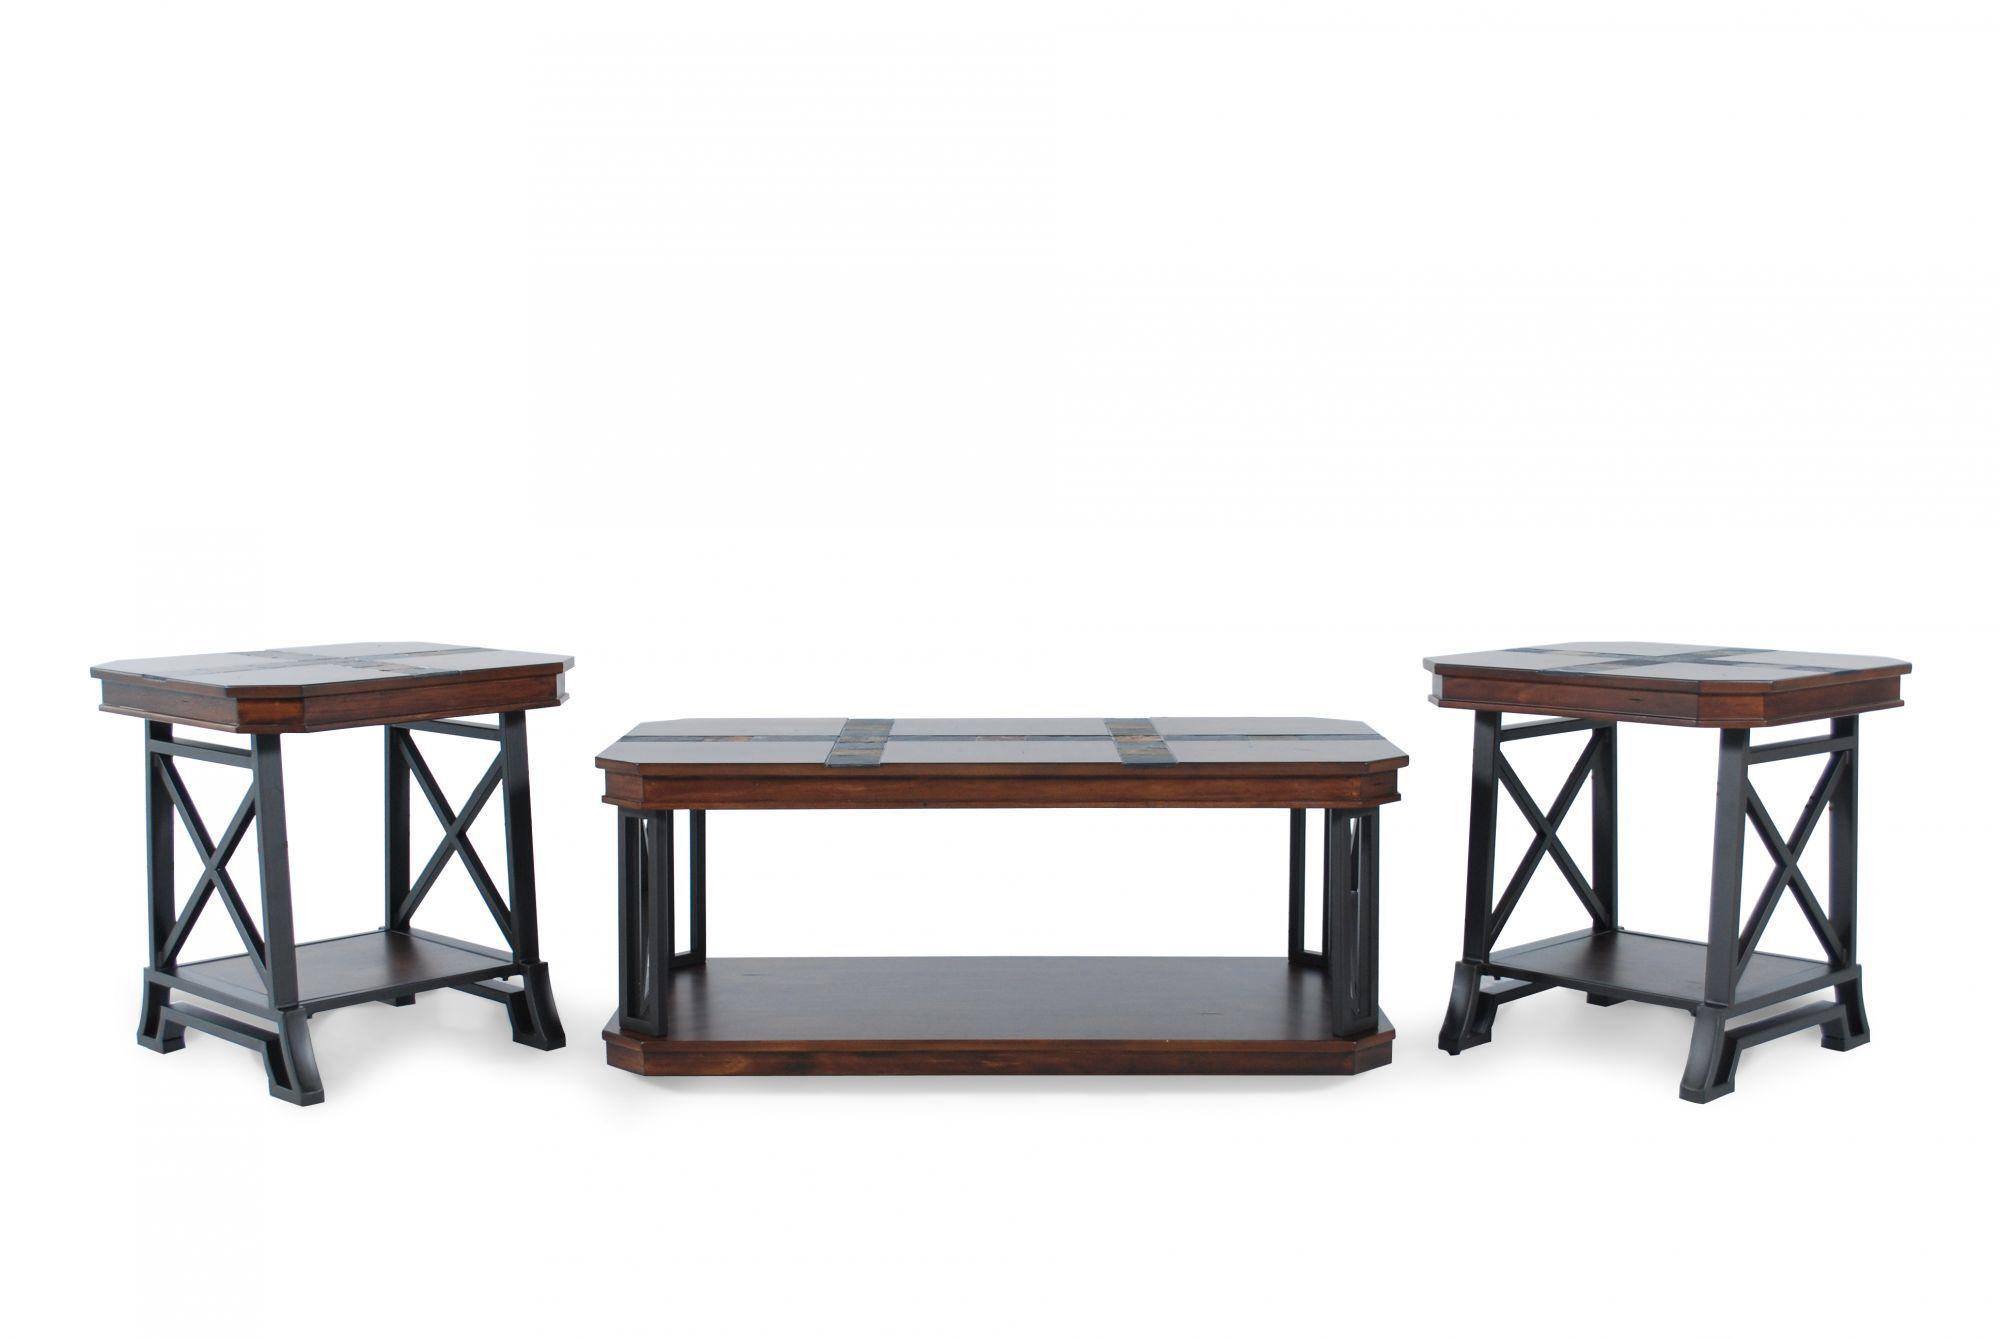 Three-Piece Coffee Table Set in Brown Three-Piece Coffee Table Set in Brown  sc 1 st  Mathis Brothers & Three-Piece Coffee Table Set in Brown | Mathis Brothers Furniture